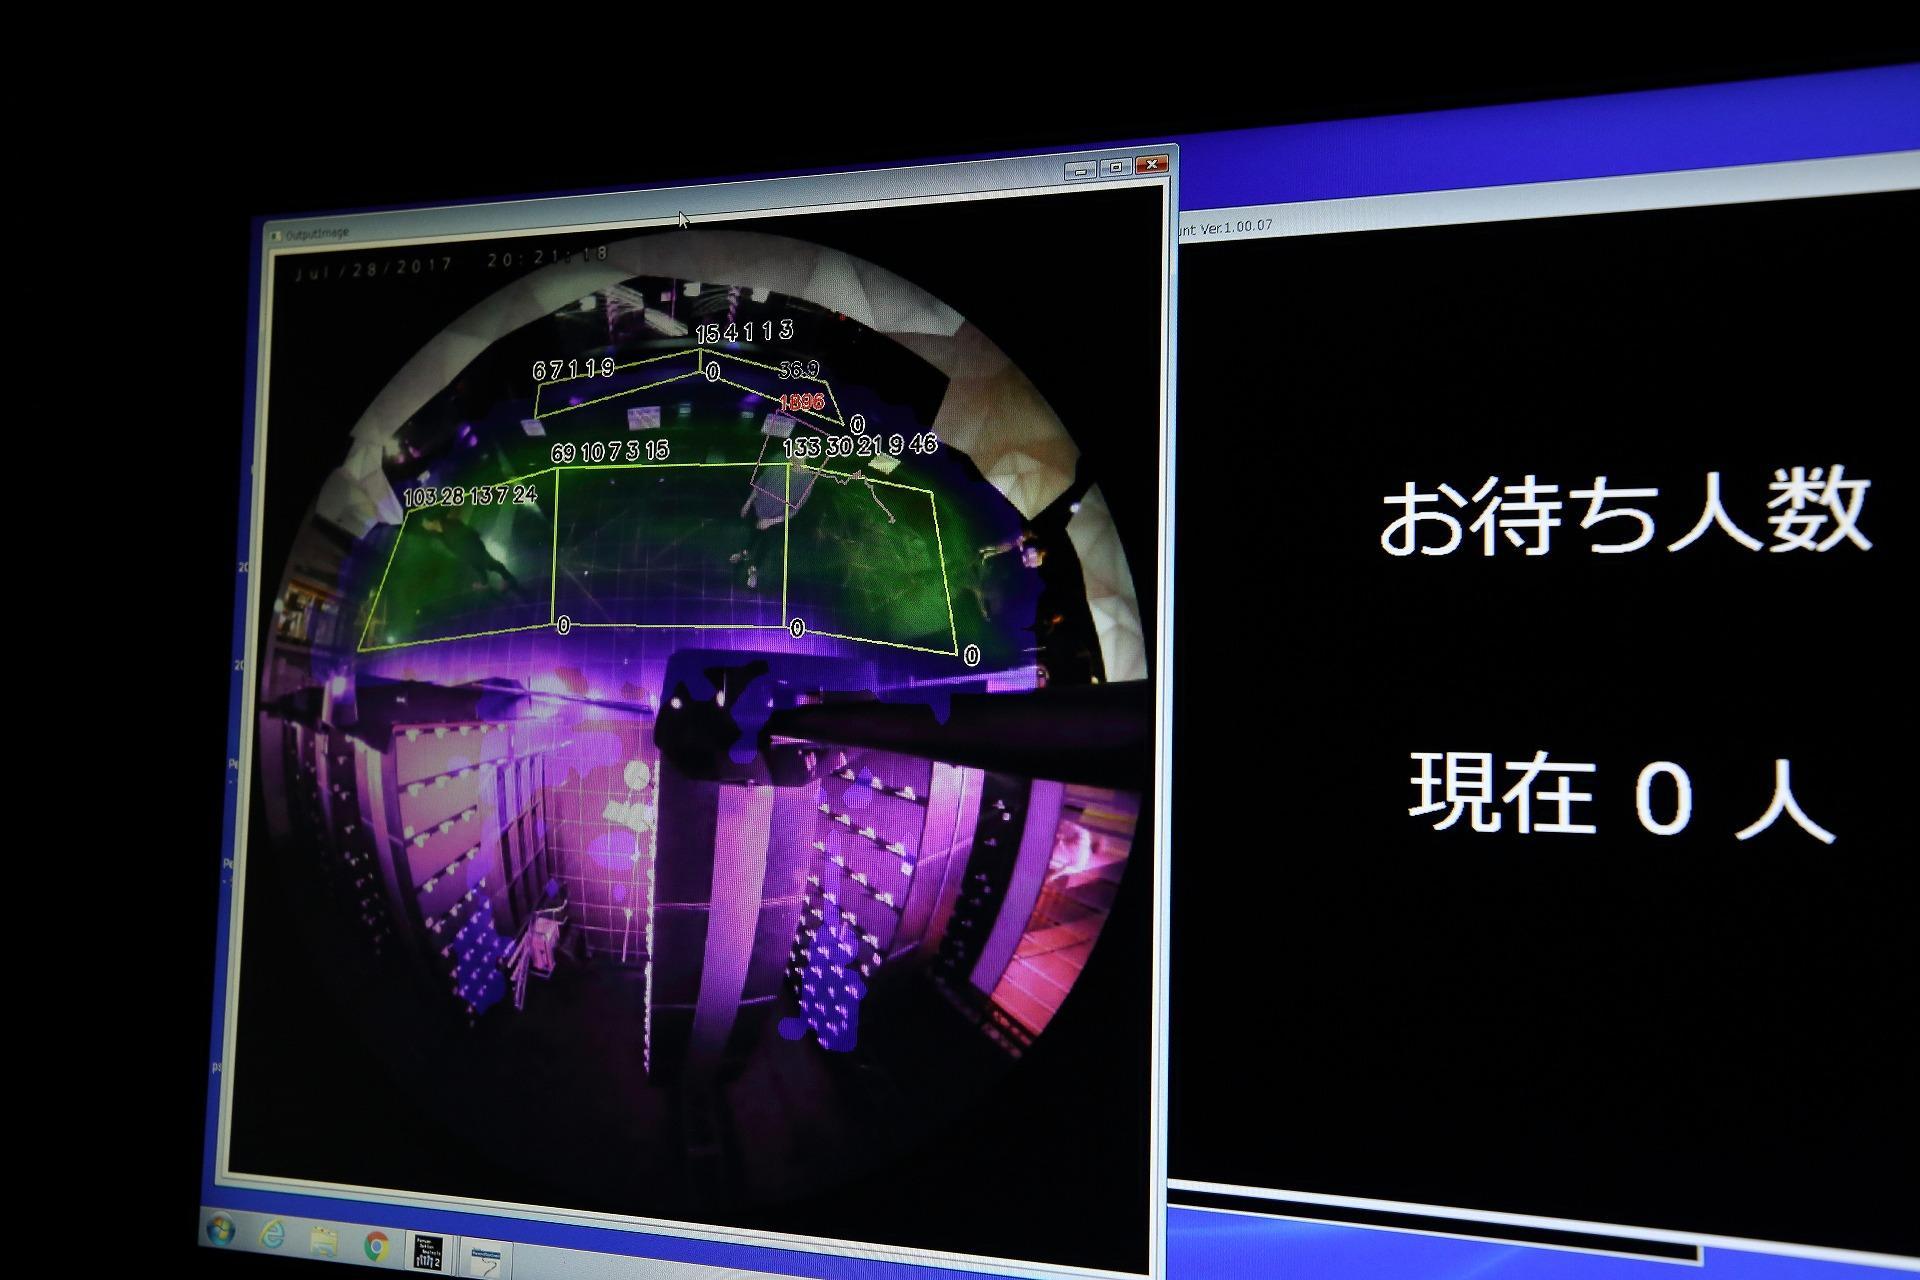 Photo of monitoring screen